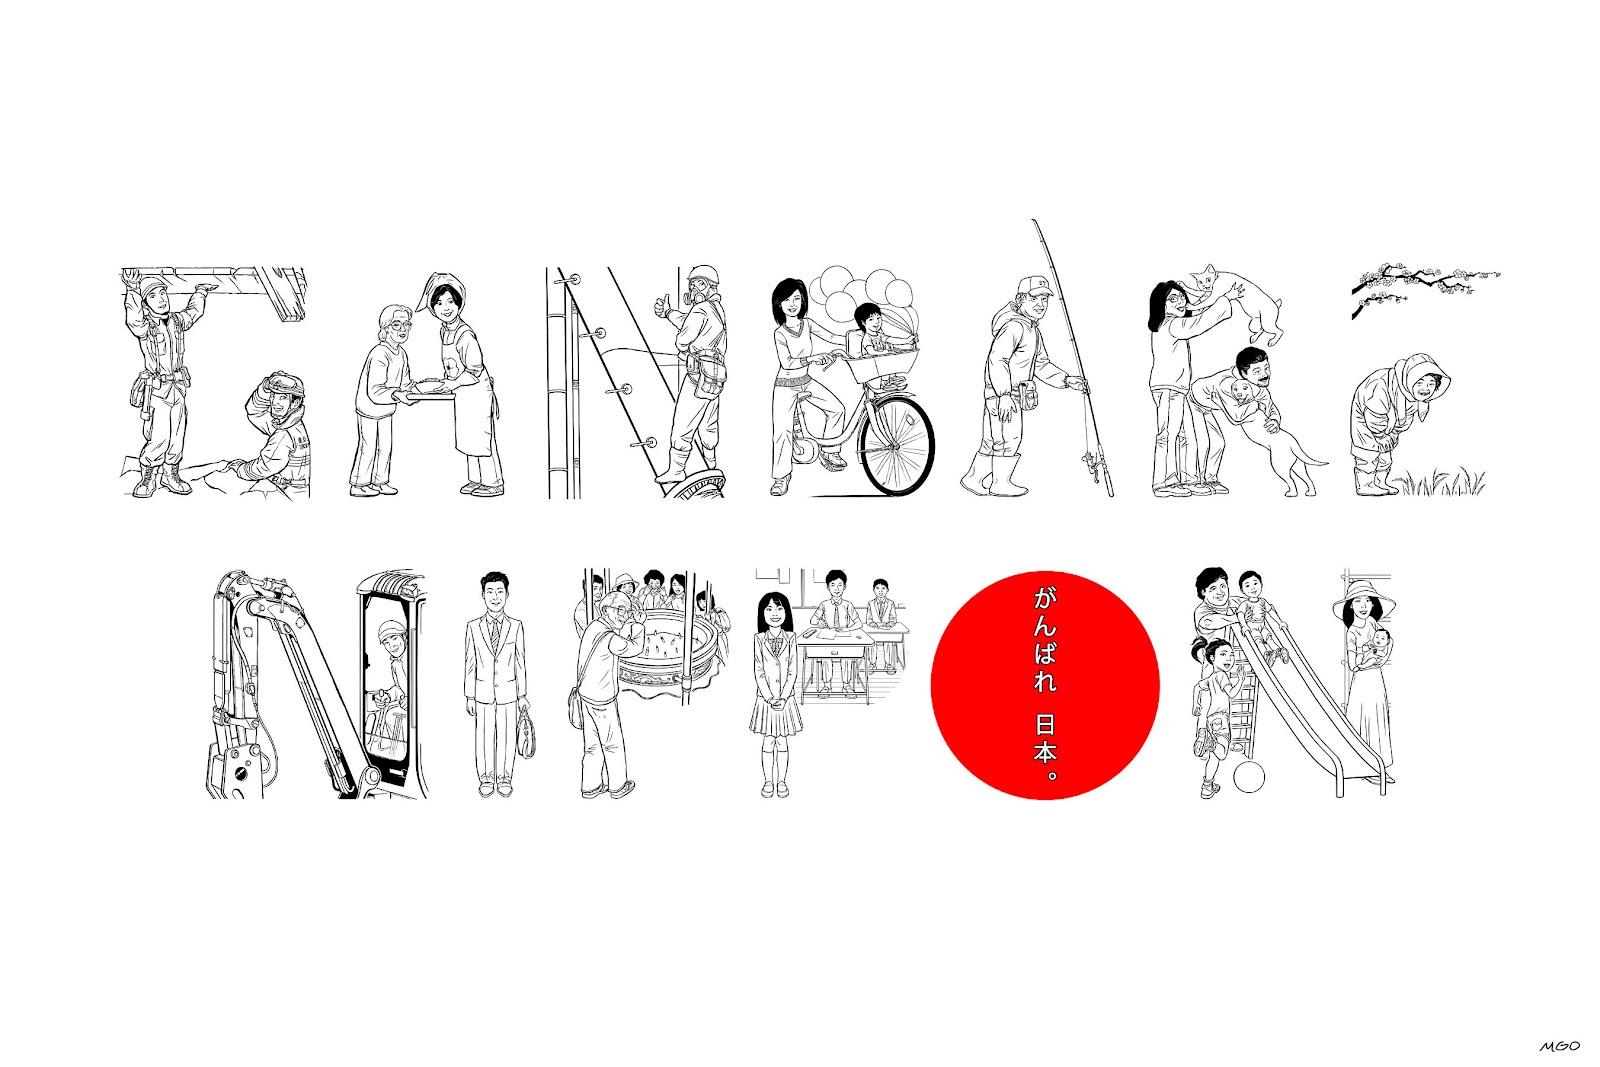 japanese wallpapers random - photo #34